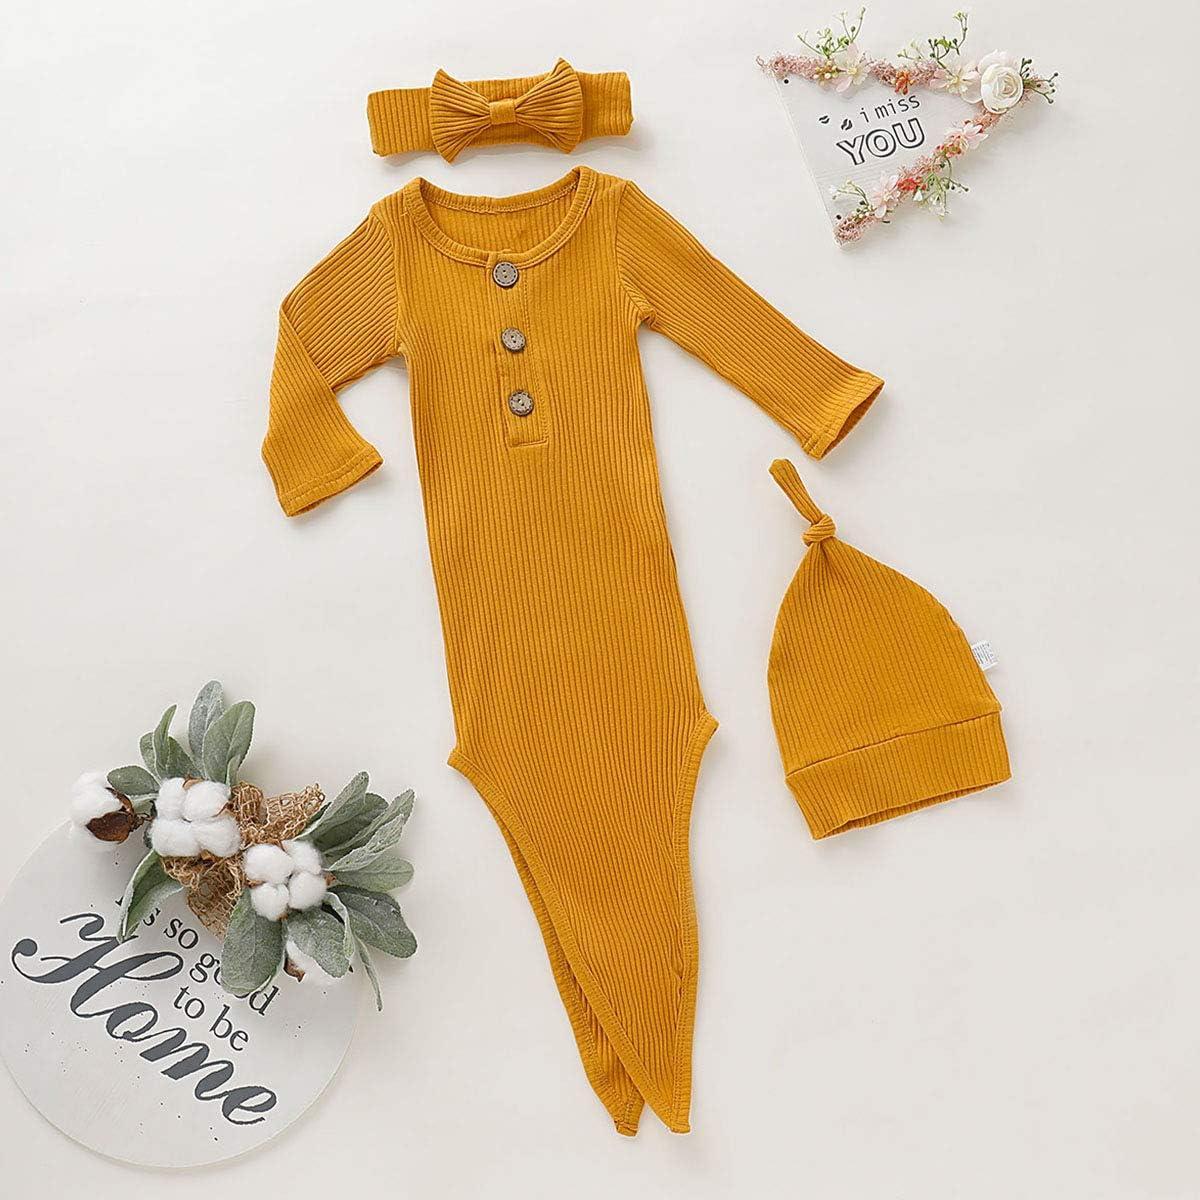 TrulyBee Newborn Baby Gender Neutral Sleepwear Infant Nightgowns with Pacifier Clip